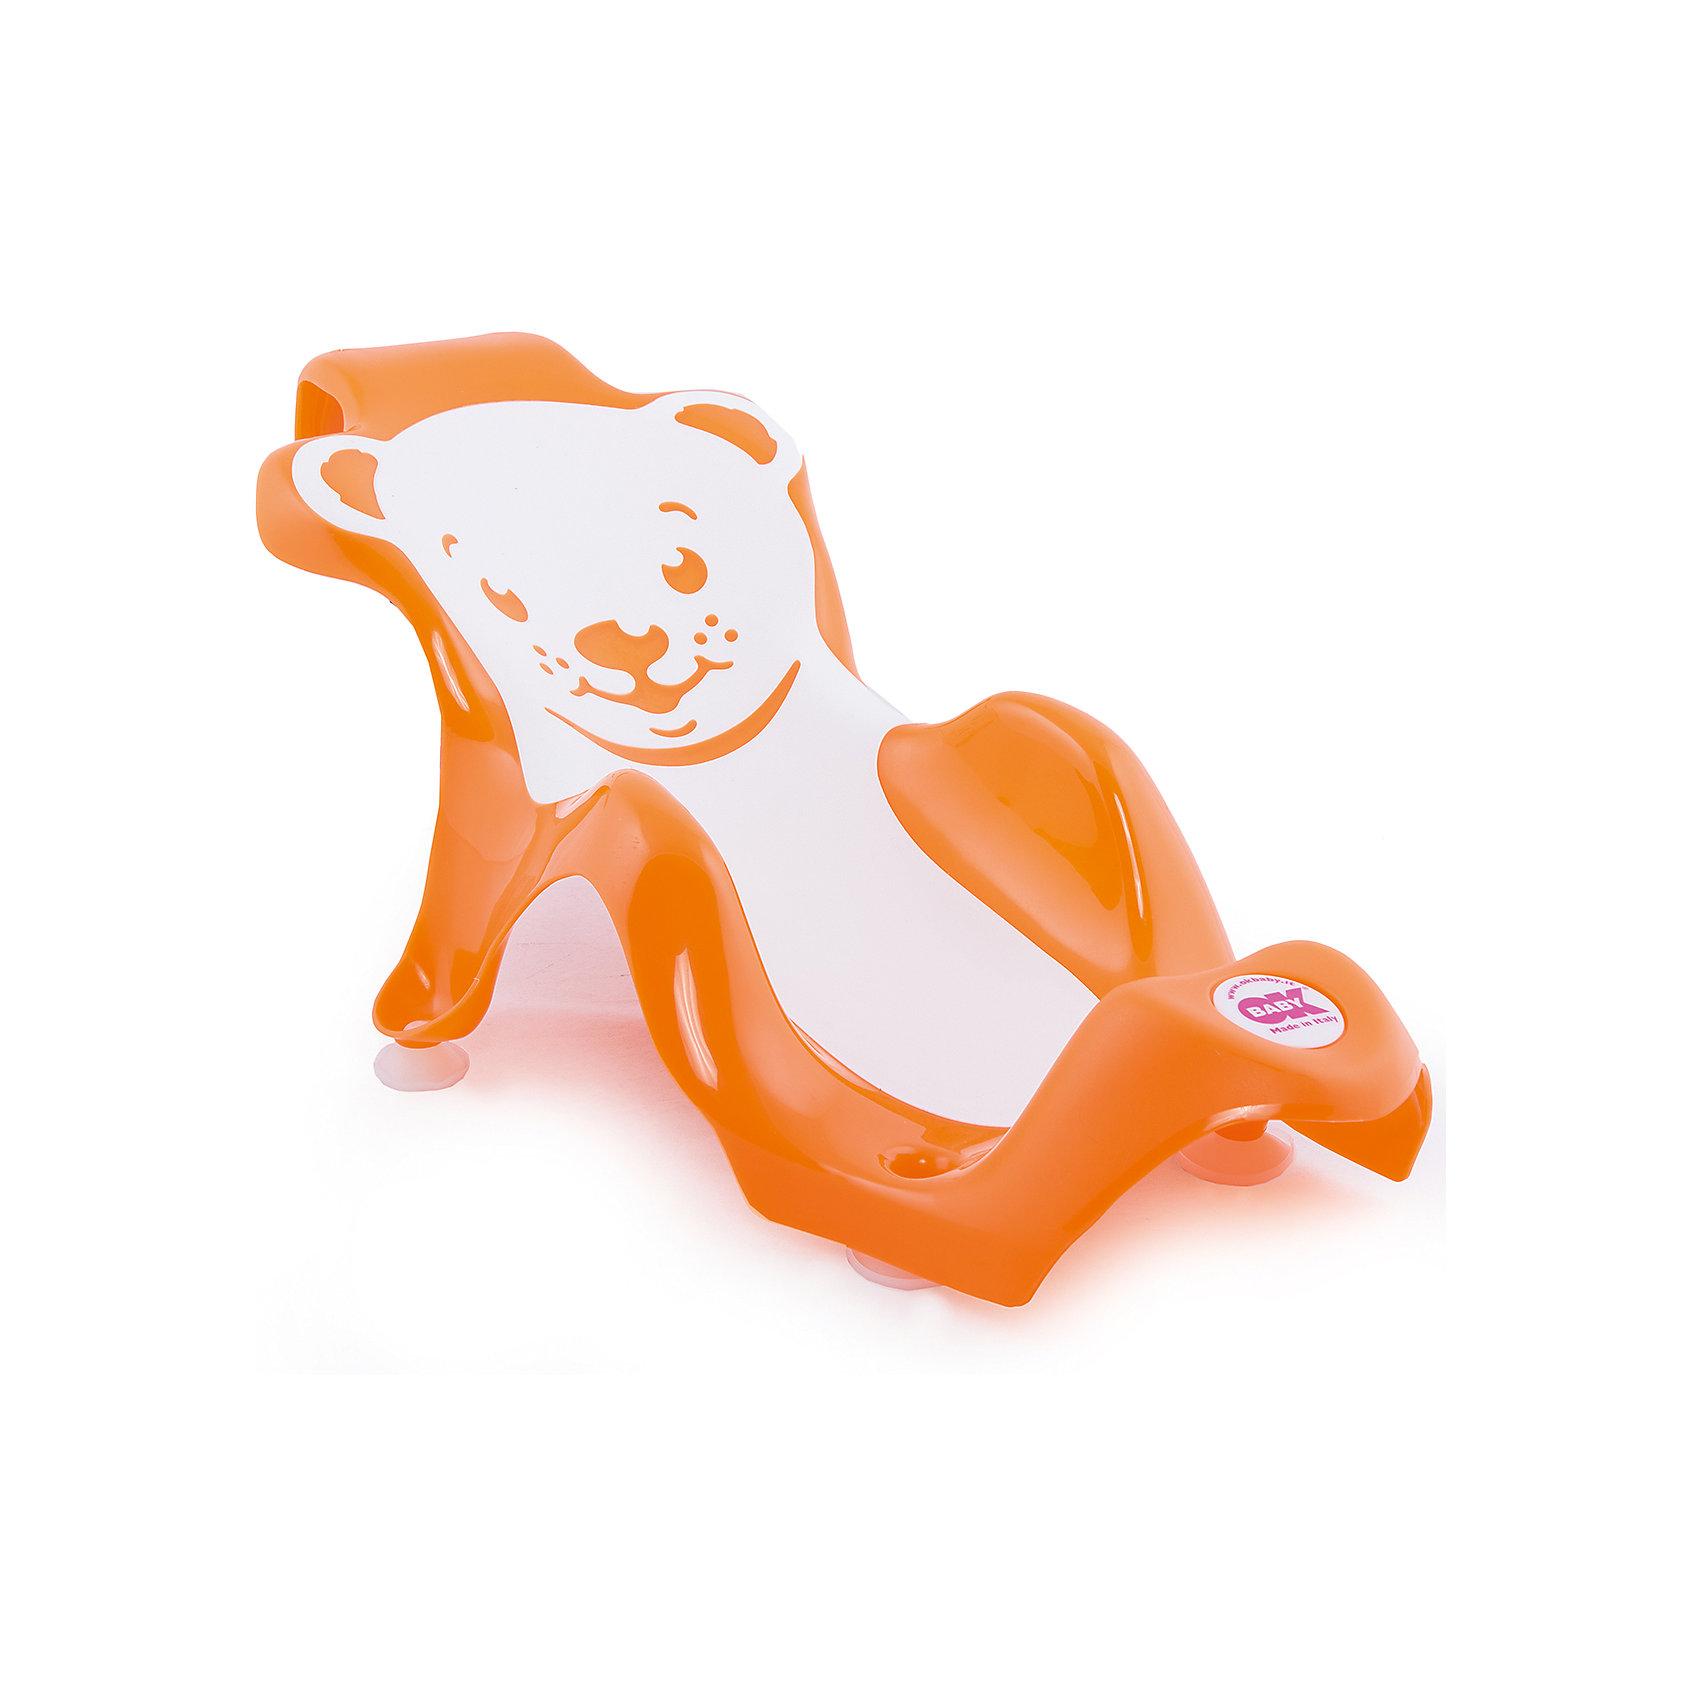 Горка для купания Buddy, Ok Baby, оранжевый<br><br>Ширина мм: 630<br>Глубина мм: 310<br>Высота мм: 250<br>Вес г: 1083<br>Возраст от месяцев: 0<br>Возраст до месяцев: 8<br>Пол: Унисекс<br>Возраст: Детский<br>SKU: 4576993